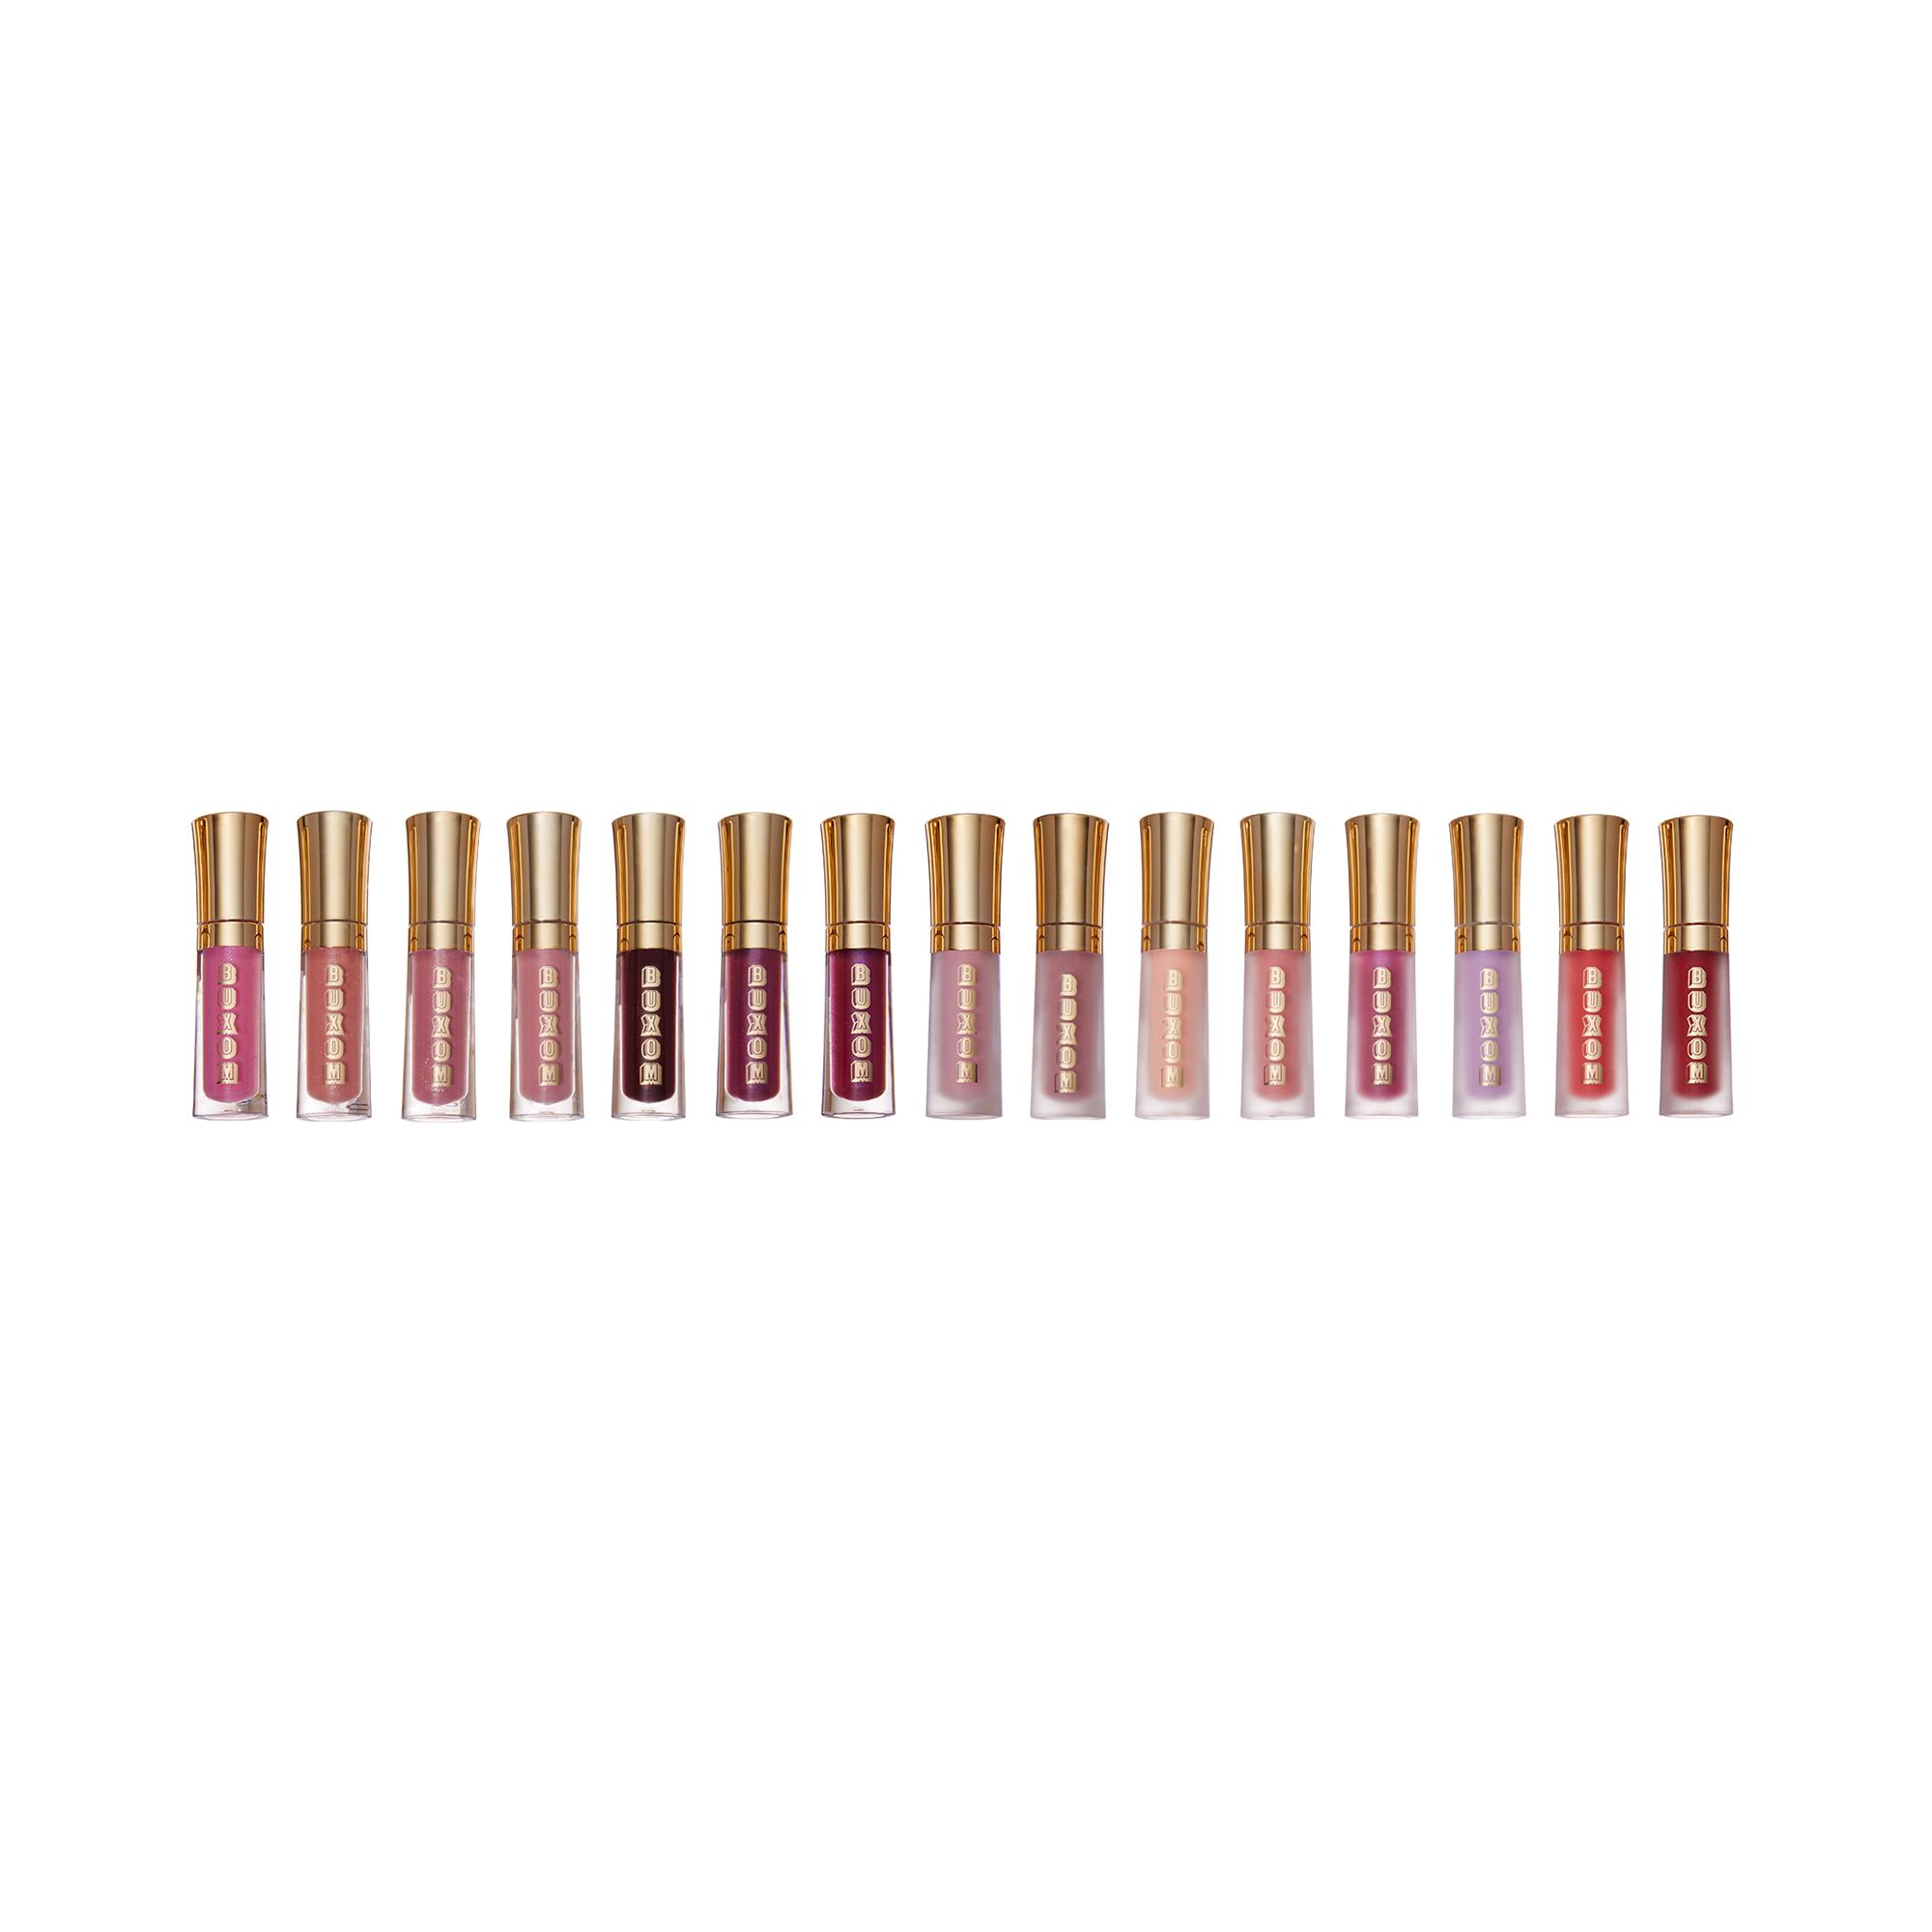 Lips off Leash Buxom 15 piece Blockbuster Lip Kit (2 ml / lipgloss )